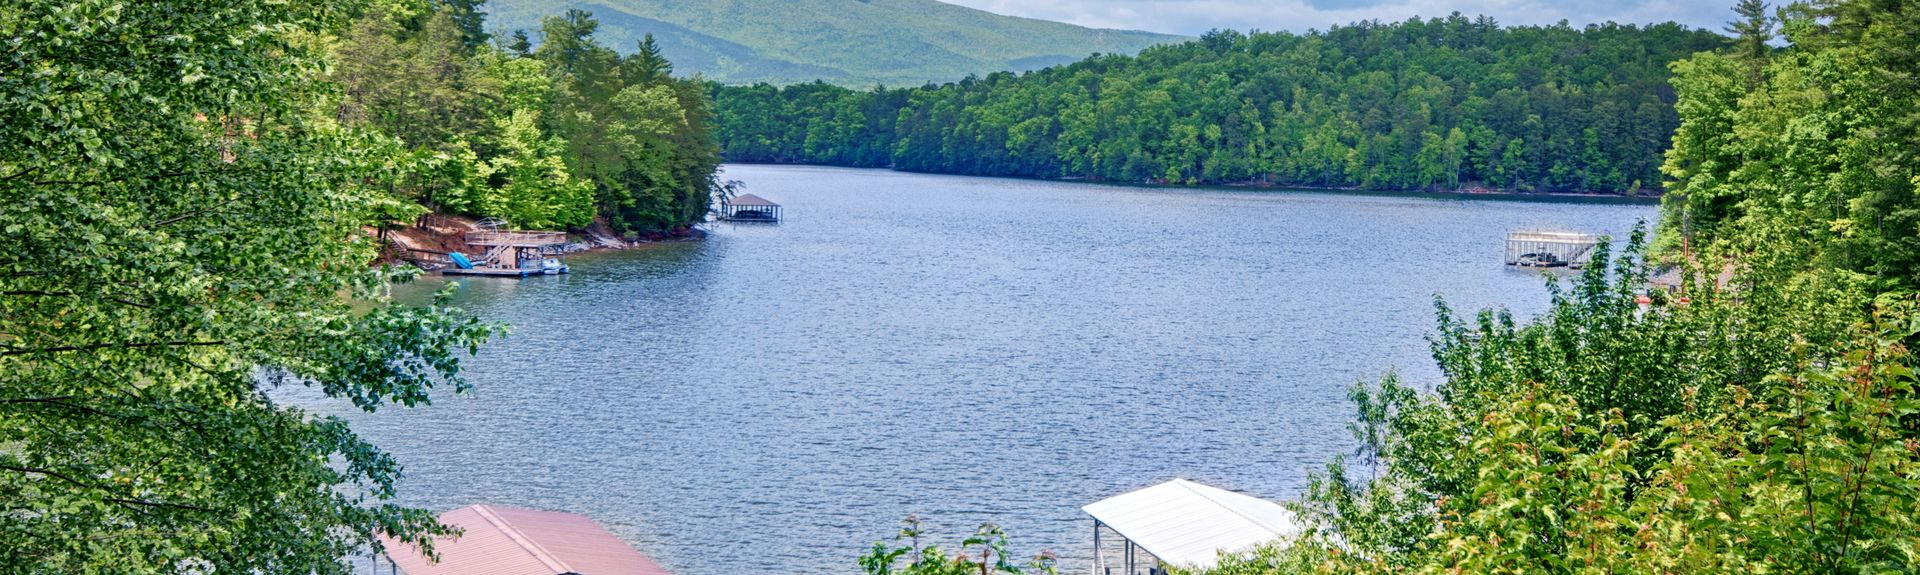 Vrbo®   Boulderline Adventure Programs, Lake Lure Vacation Rentals